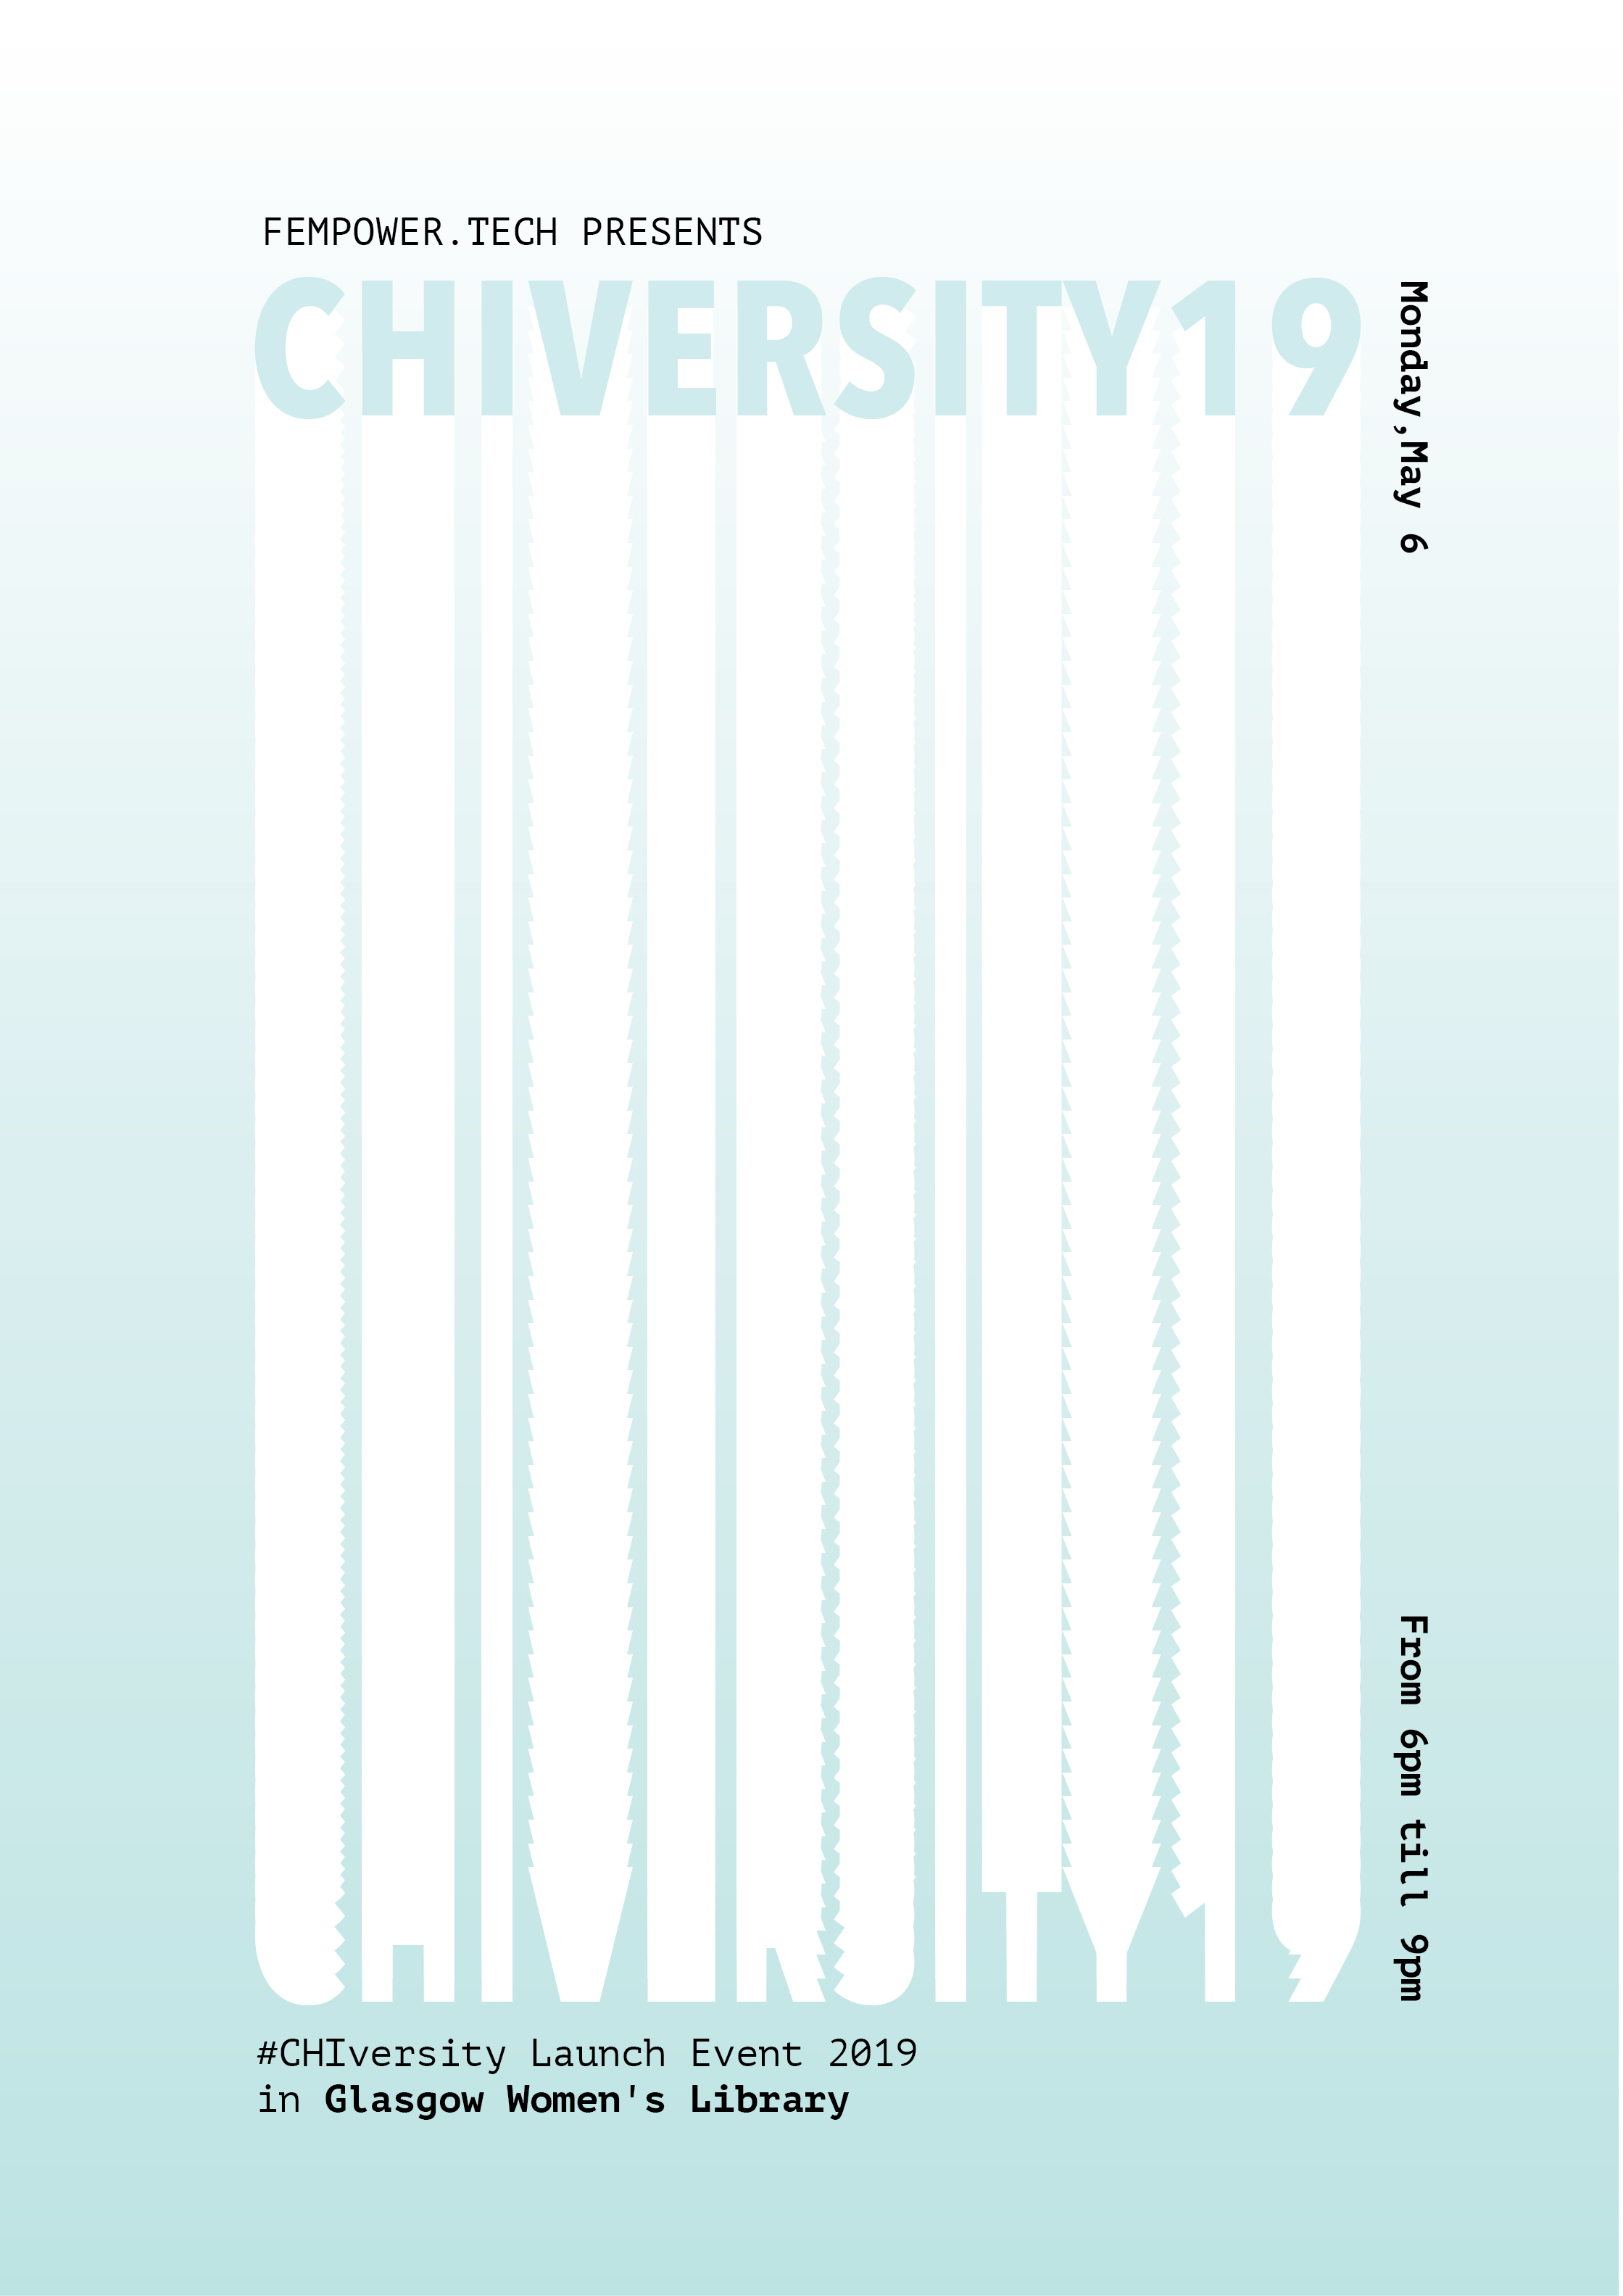 #CHIversity 2019